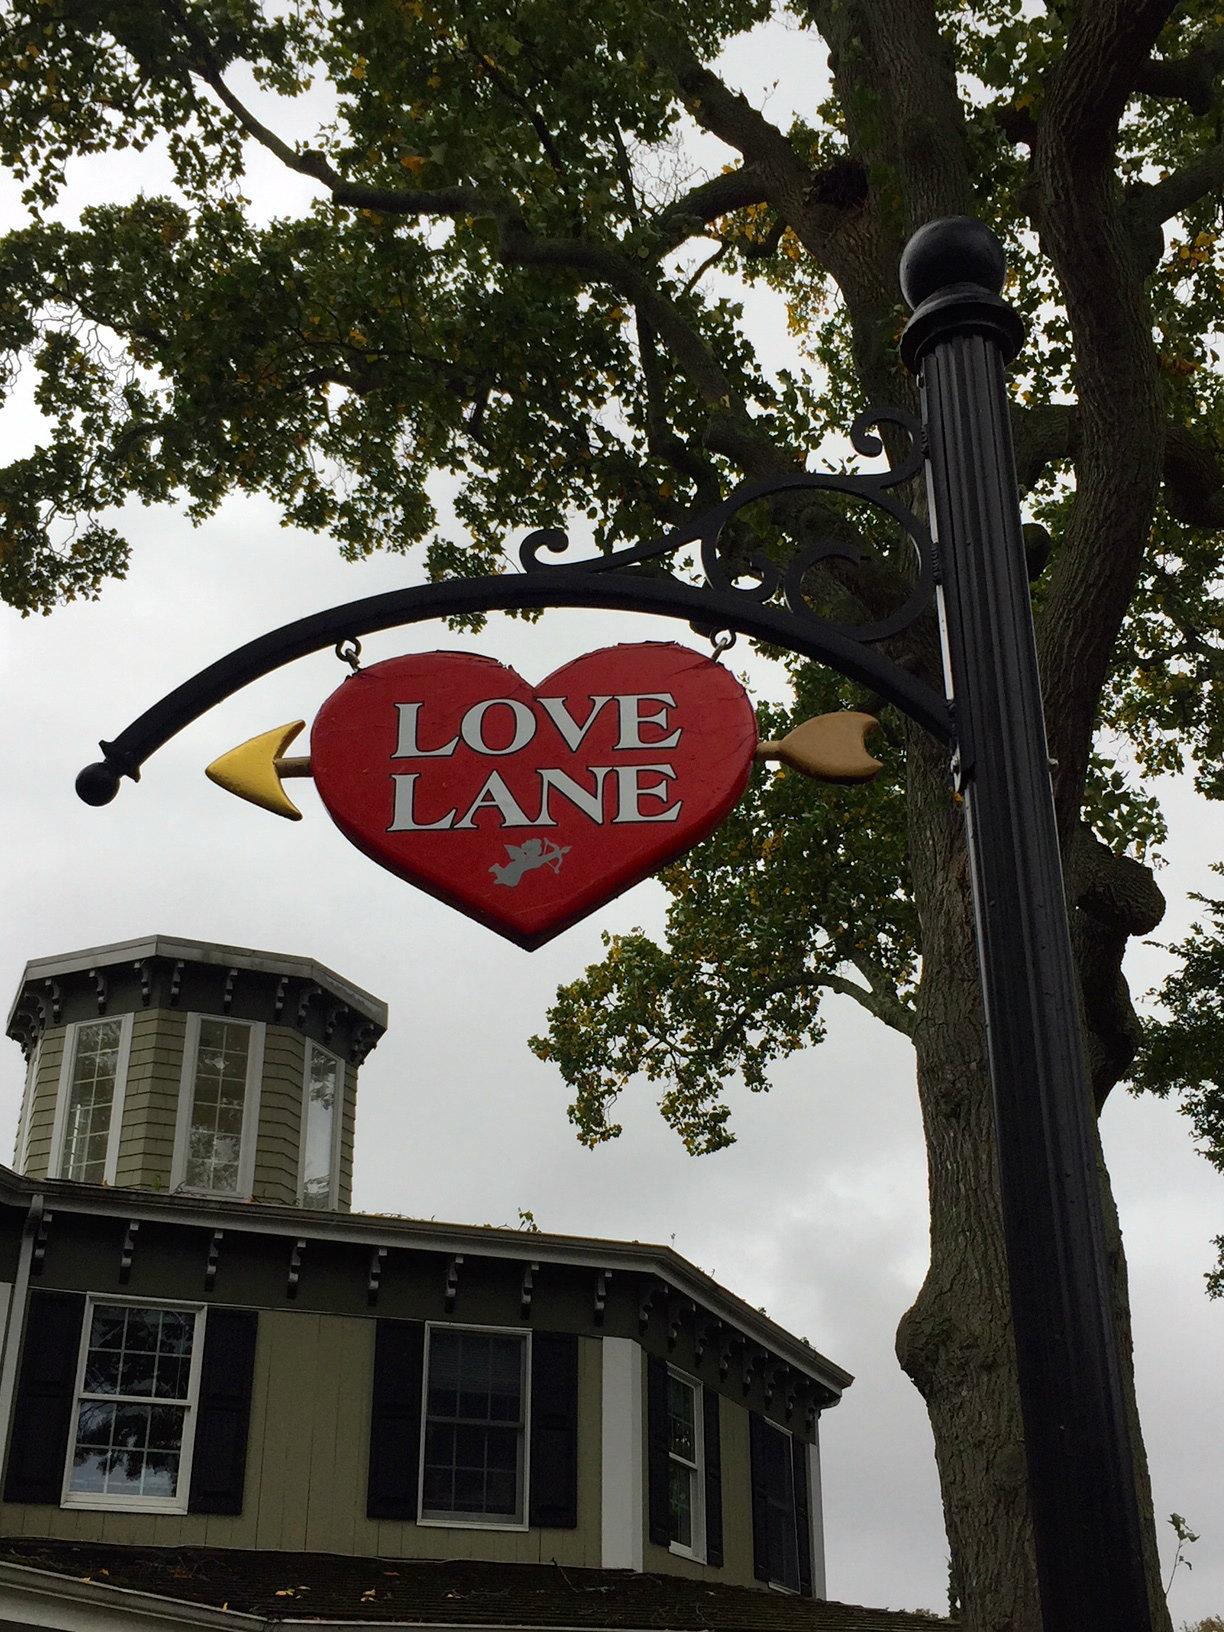 Love Lane in Mattituck, North Fork, Long Island